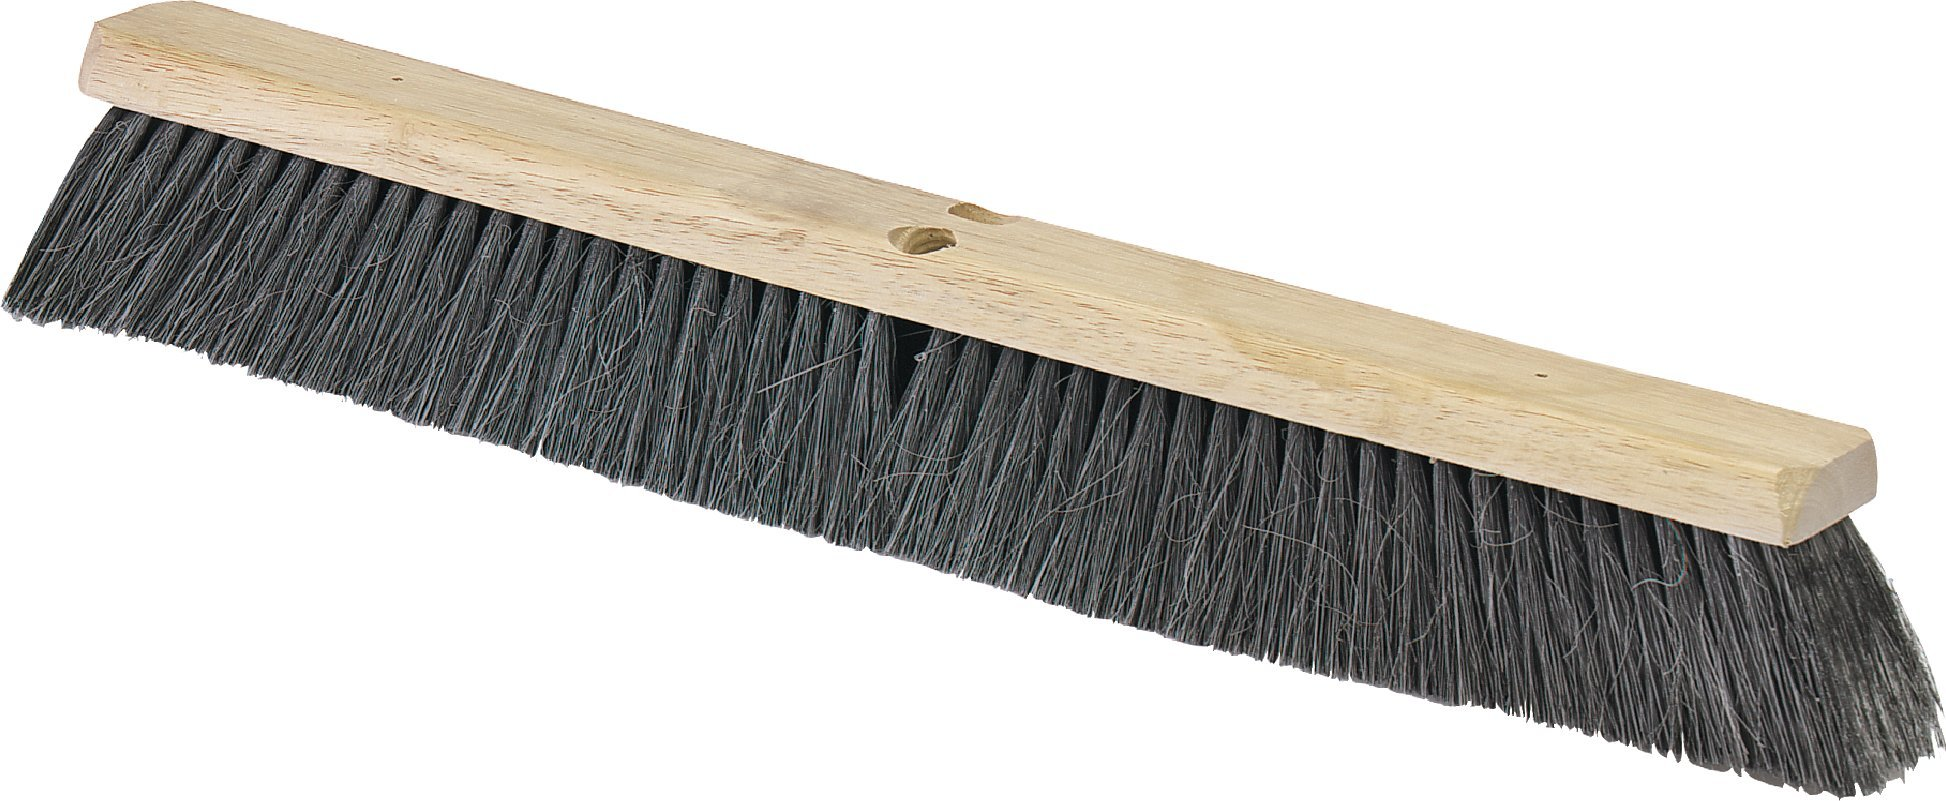 Carlisle 36203603 Flo-Pac Medium Floor Sweep, 36''-Long Hardwood Block, 3''-Long Black Horsehair/Polypropylene Bristles (Case of 6)